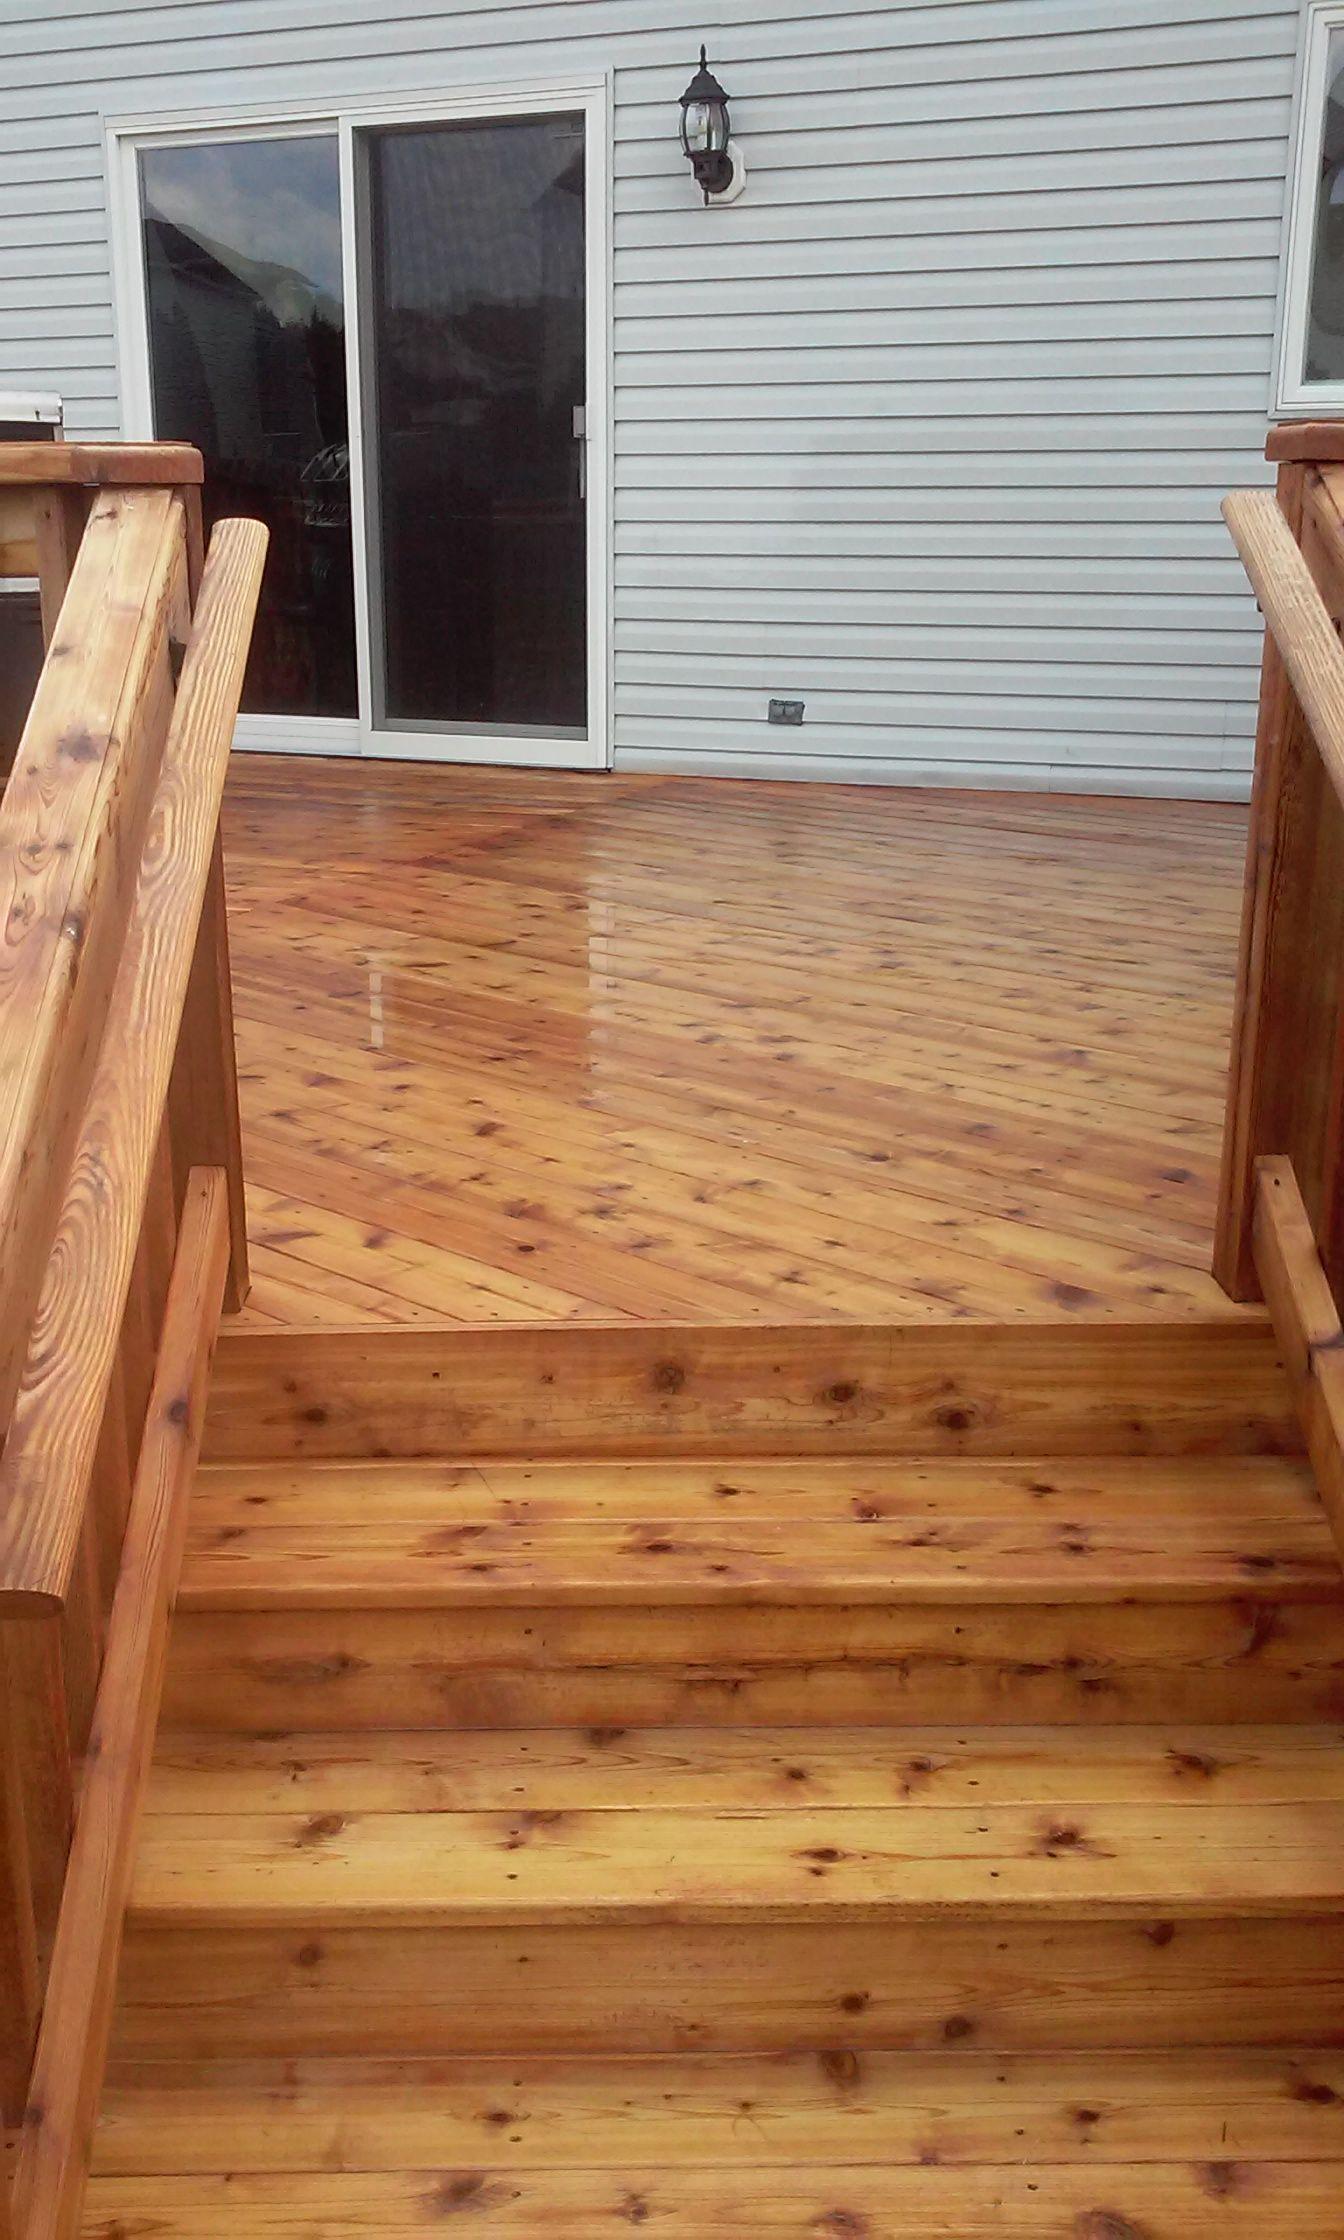 Custom Cedar Wood Deck For Your Backyard Decking Ideas Diy S Wood Deck Decks Backyard Deck